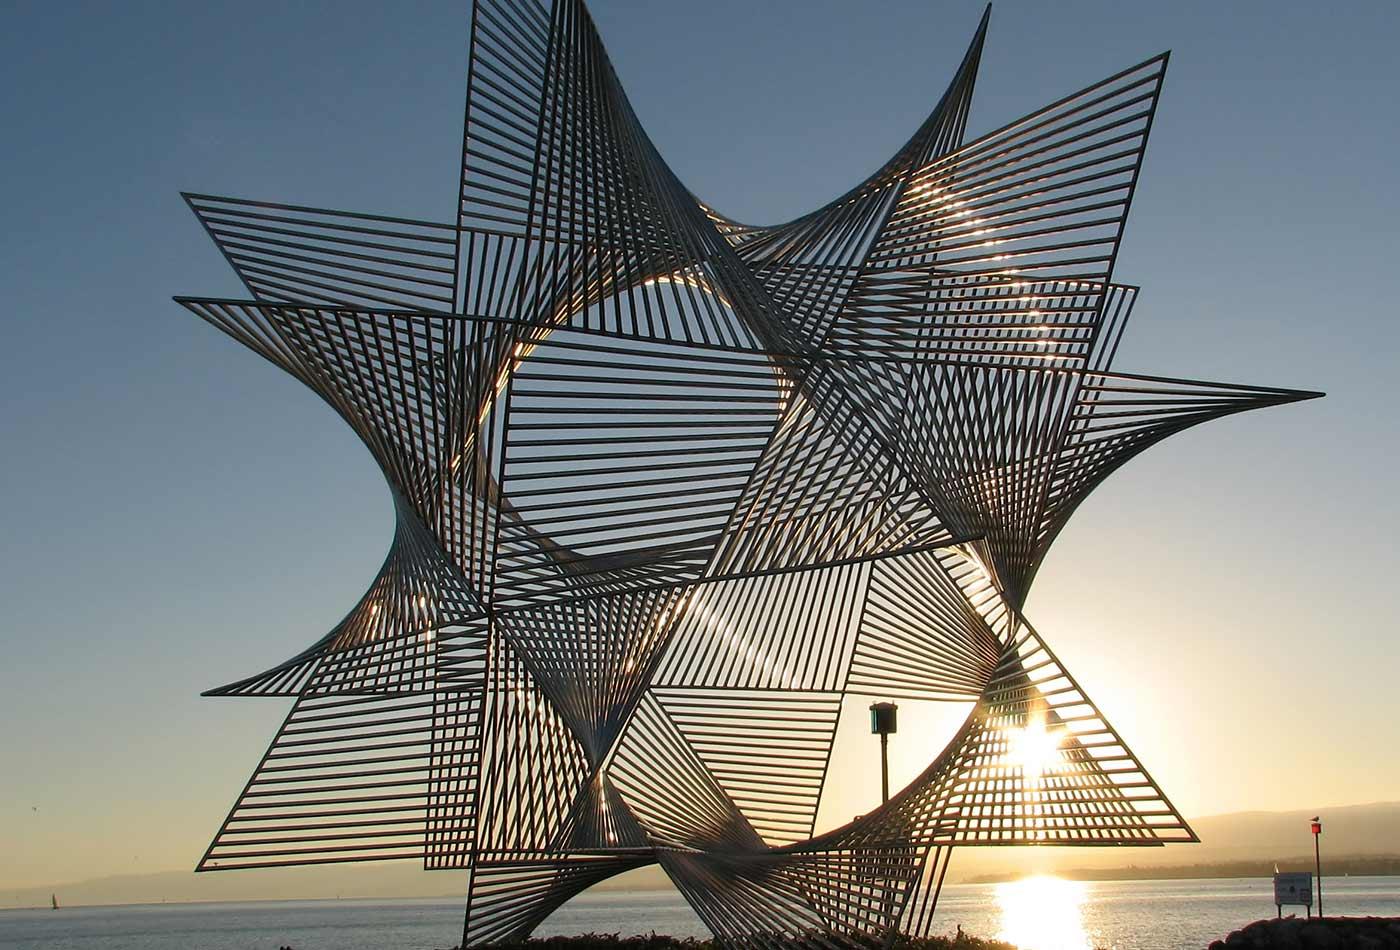 Lausanne Ouchy Skulptur.